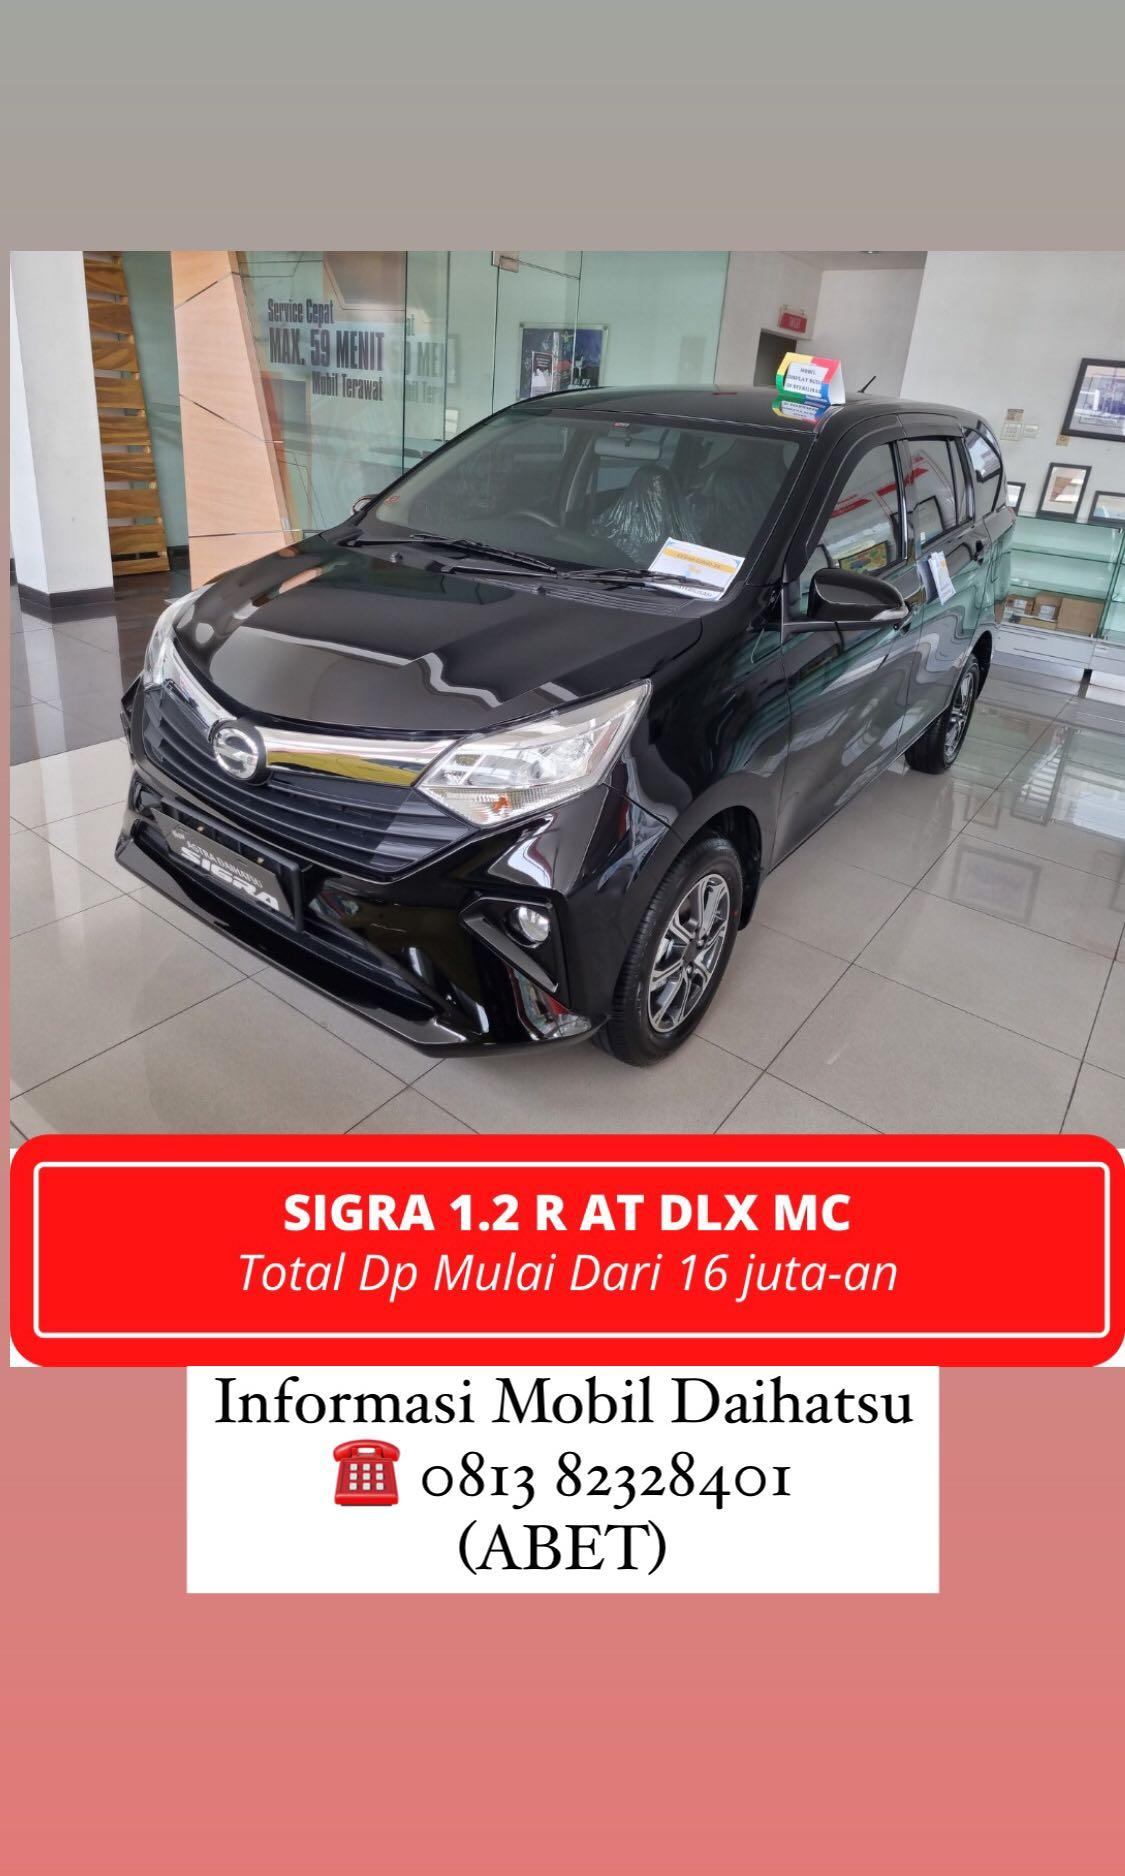 DP MURAH Daihatsu Sigra mulai 16 jutaan. Daihatsu Fatmawati